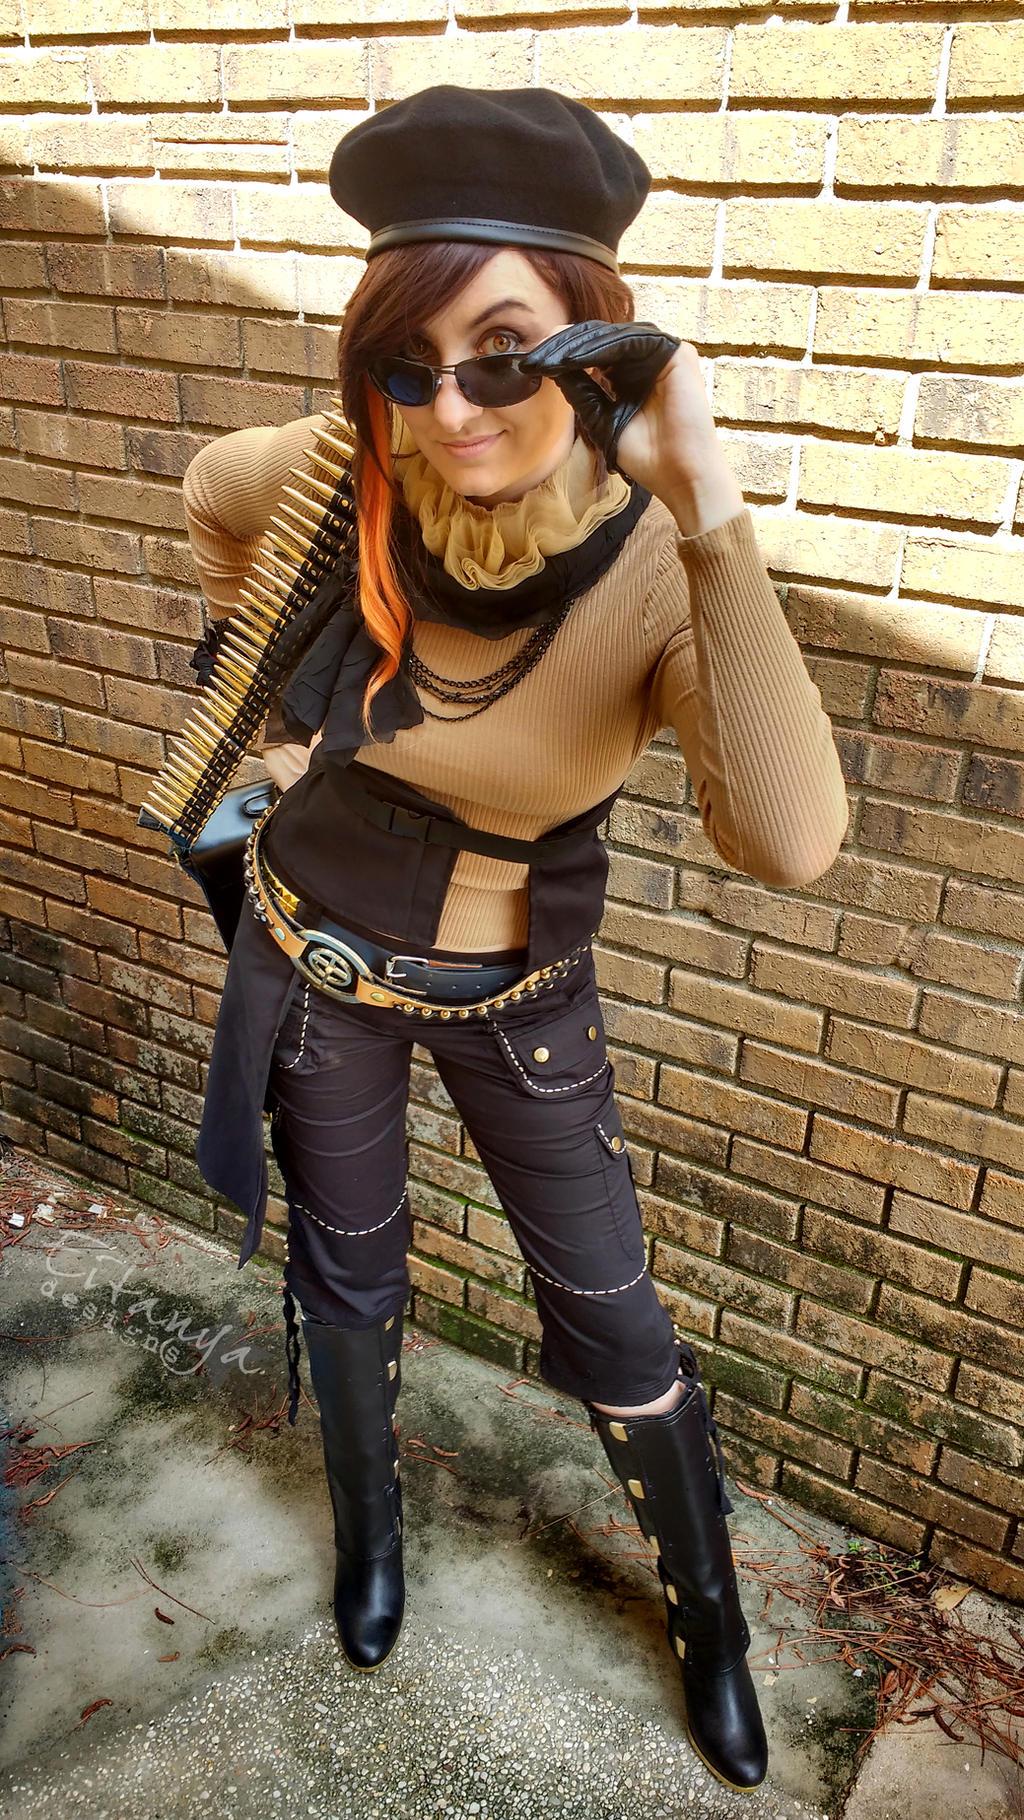 RWBY - Coco Adel cosplay by eitanya